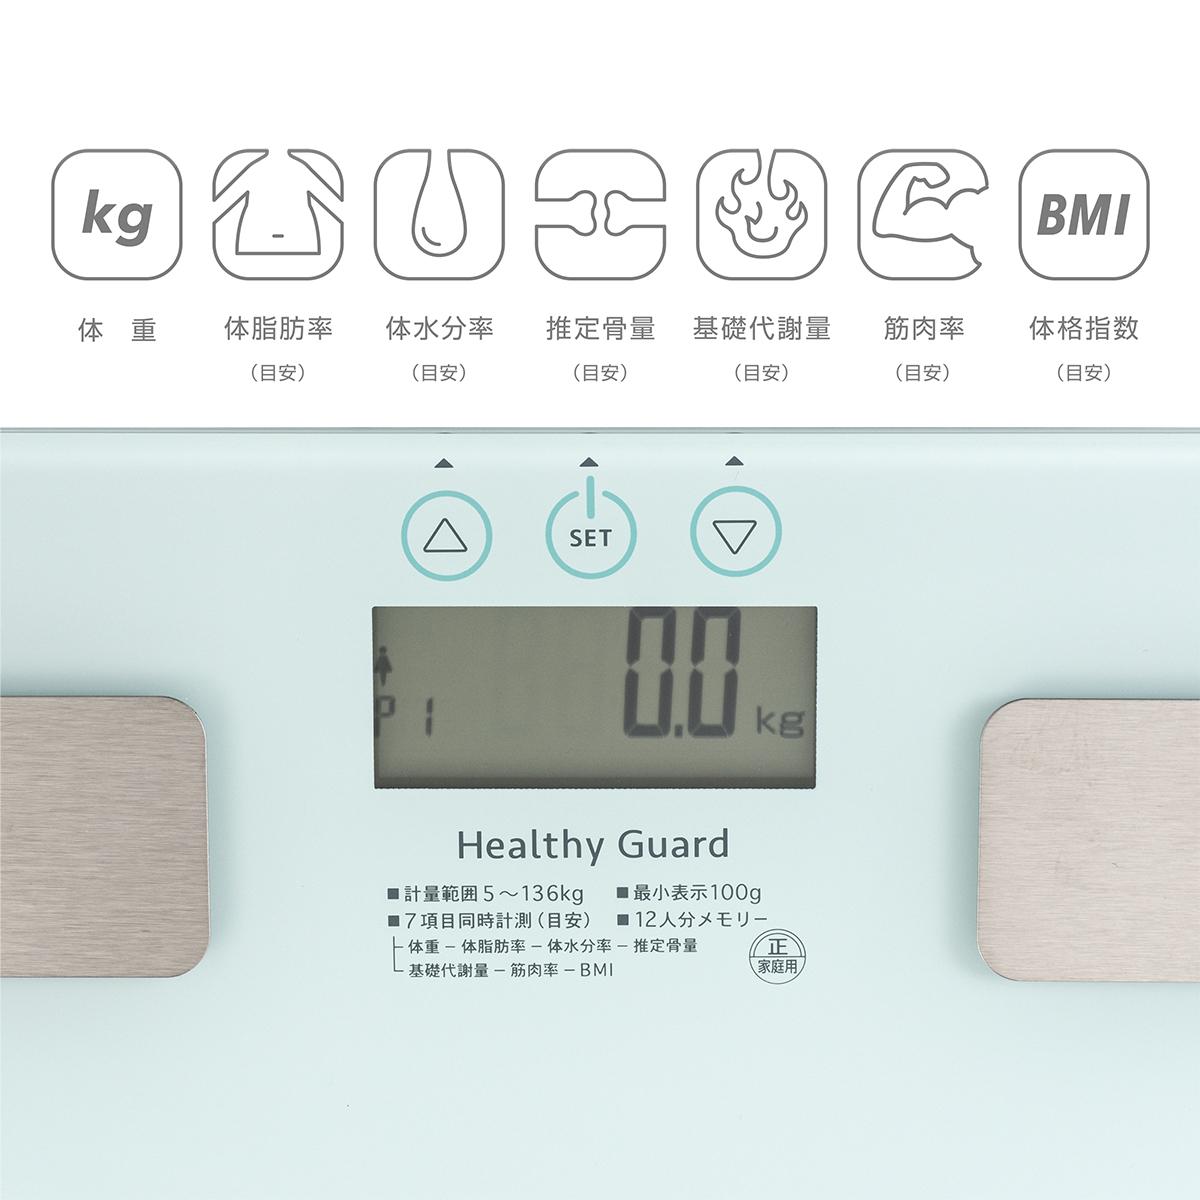 Healthy Guard 体組成計ヘルスメーター image02